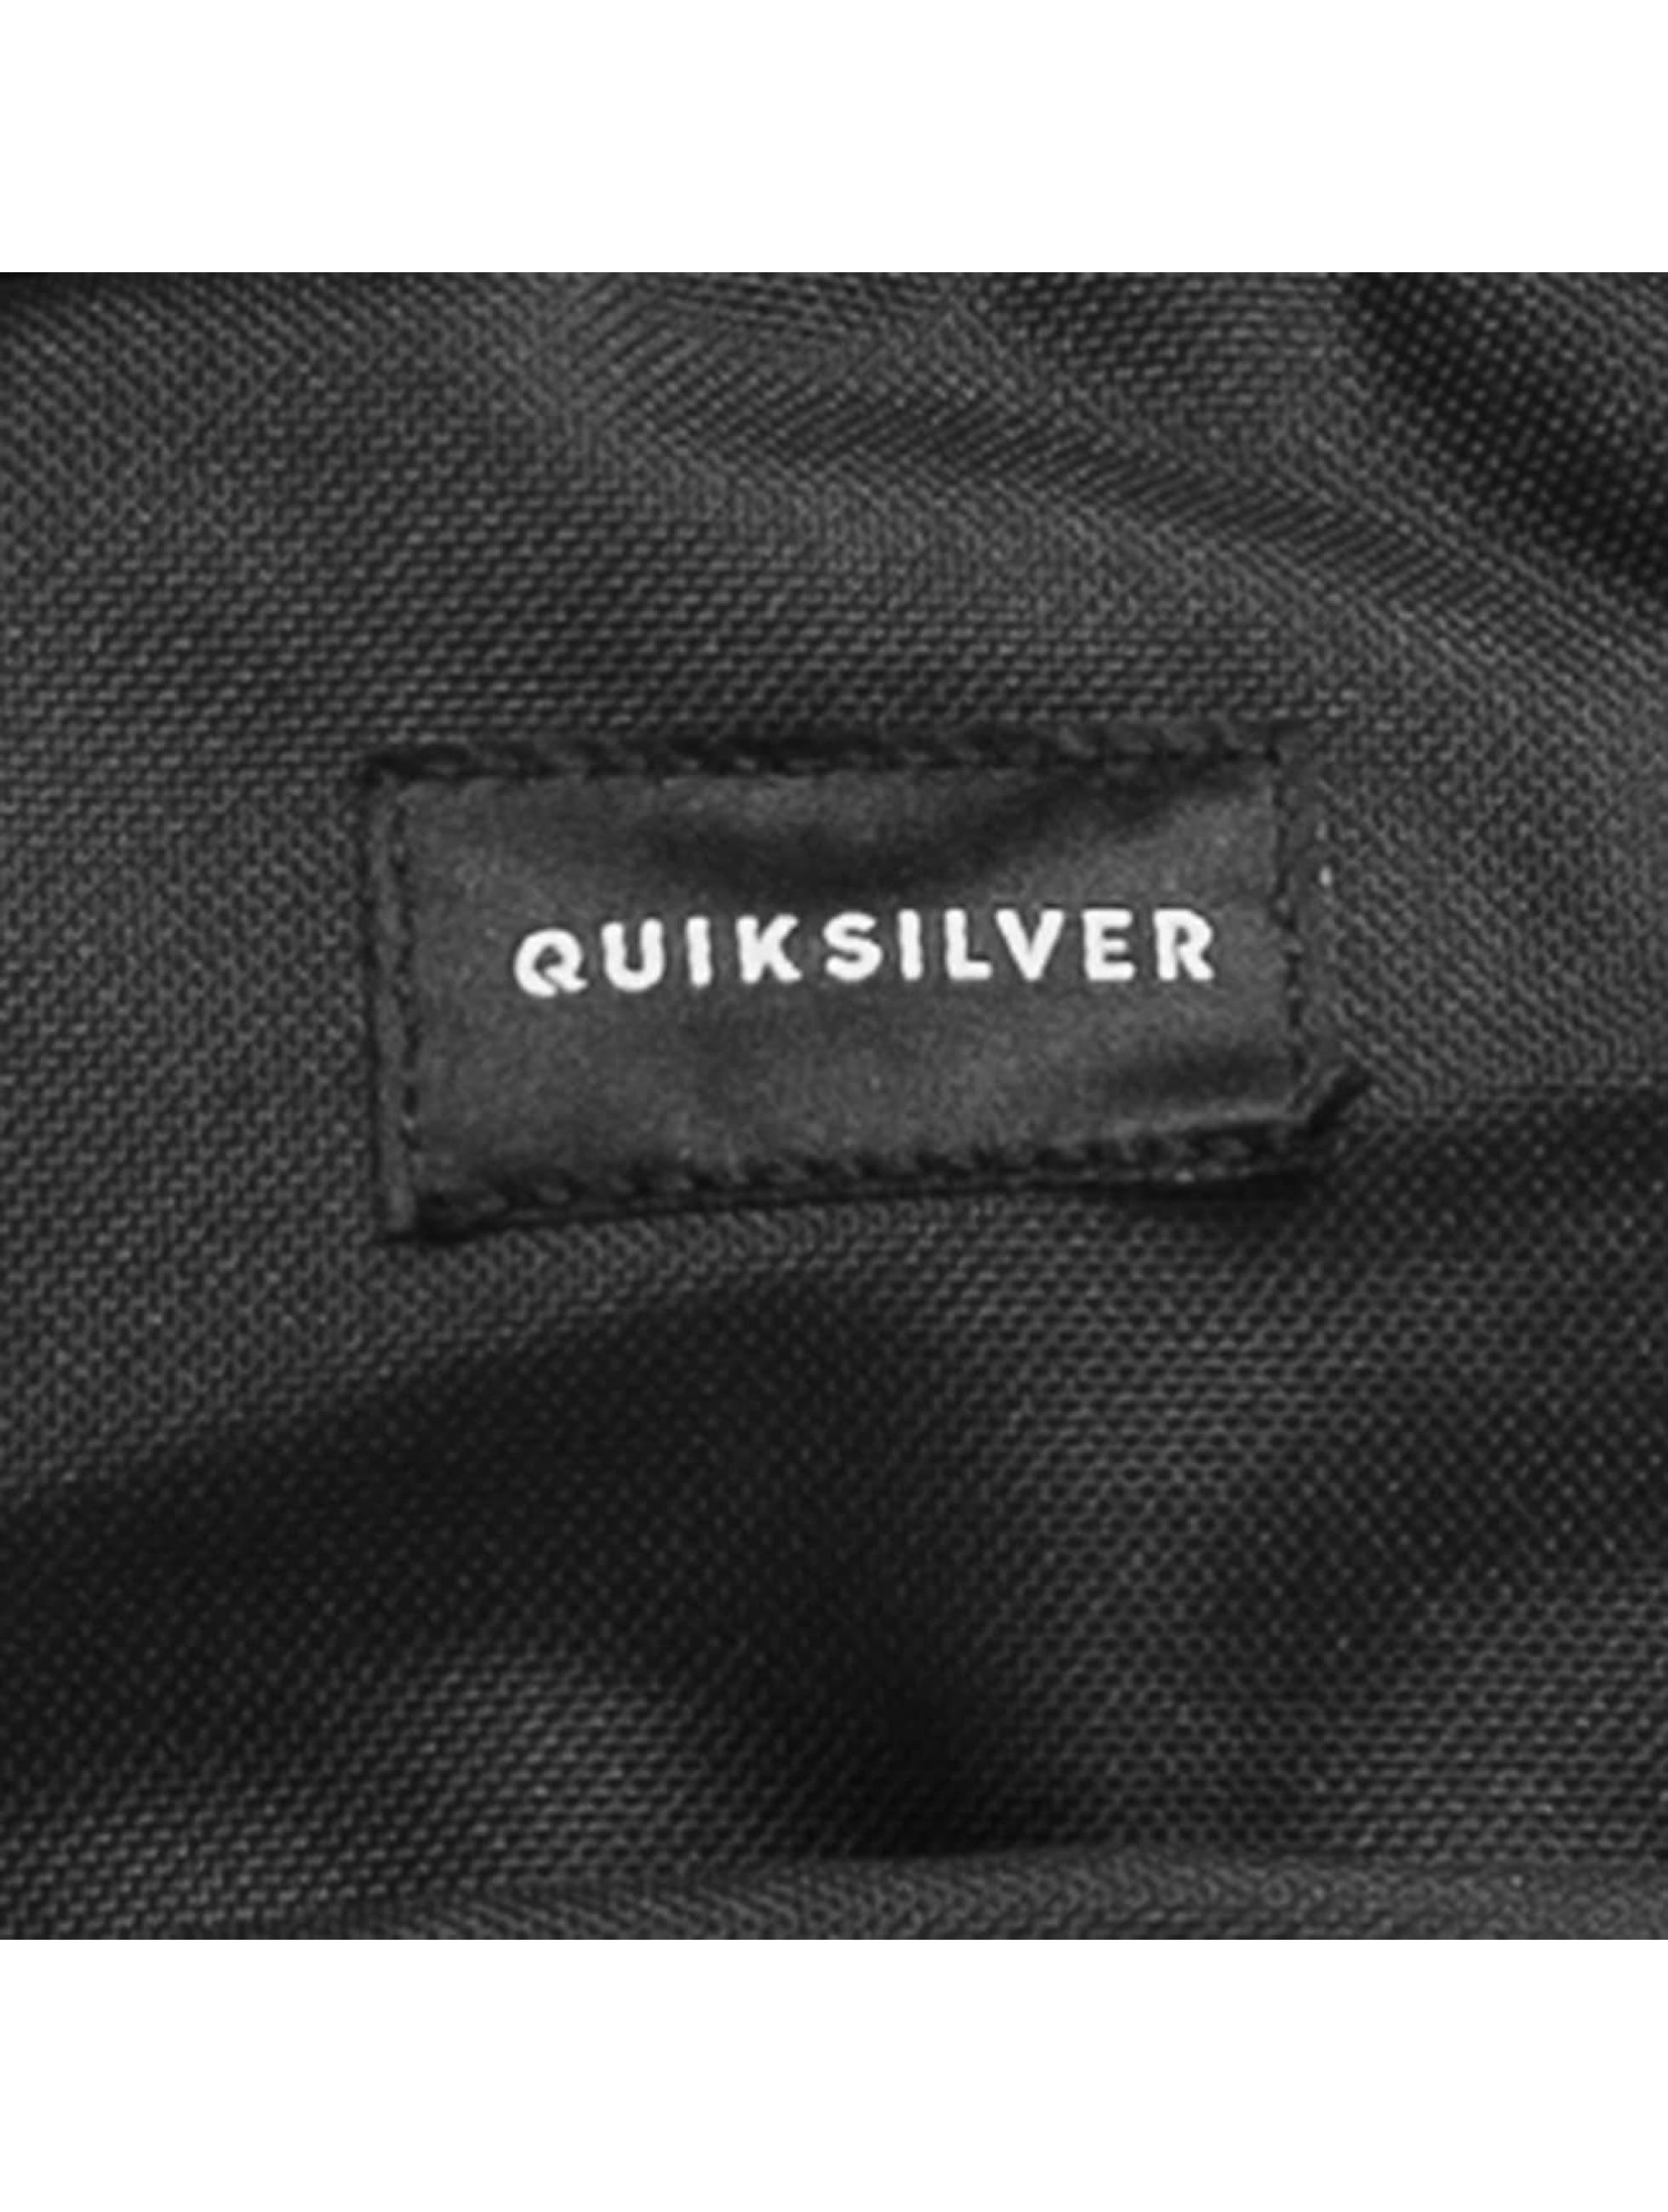 Quiksilver Rygsæk Burst sort